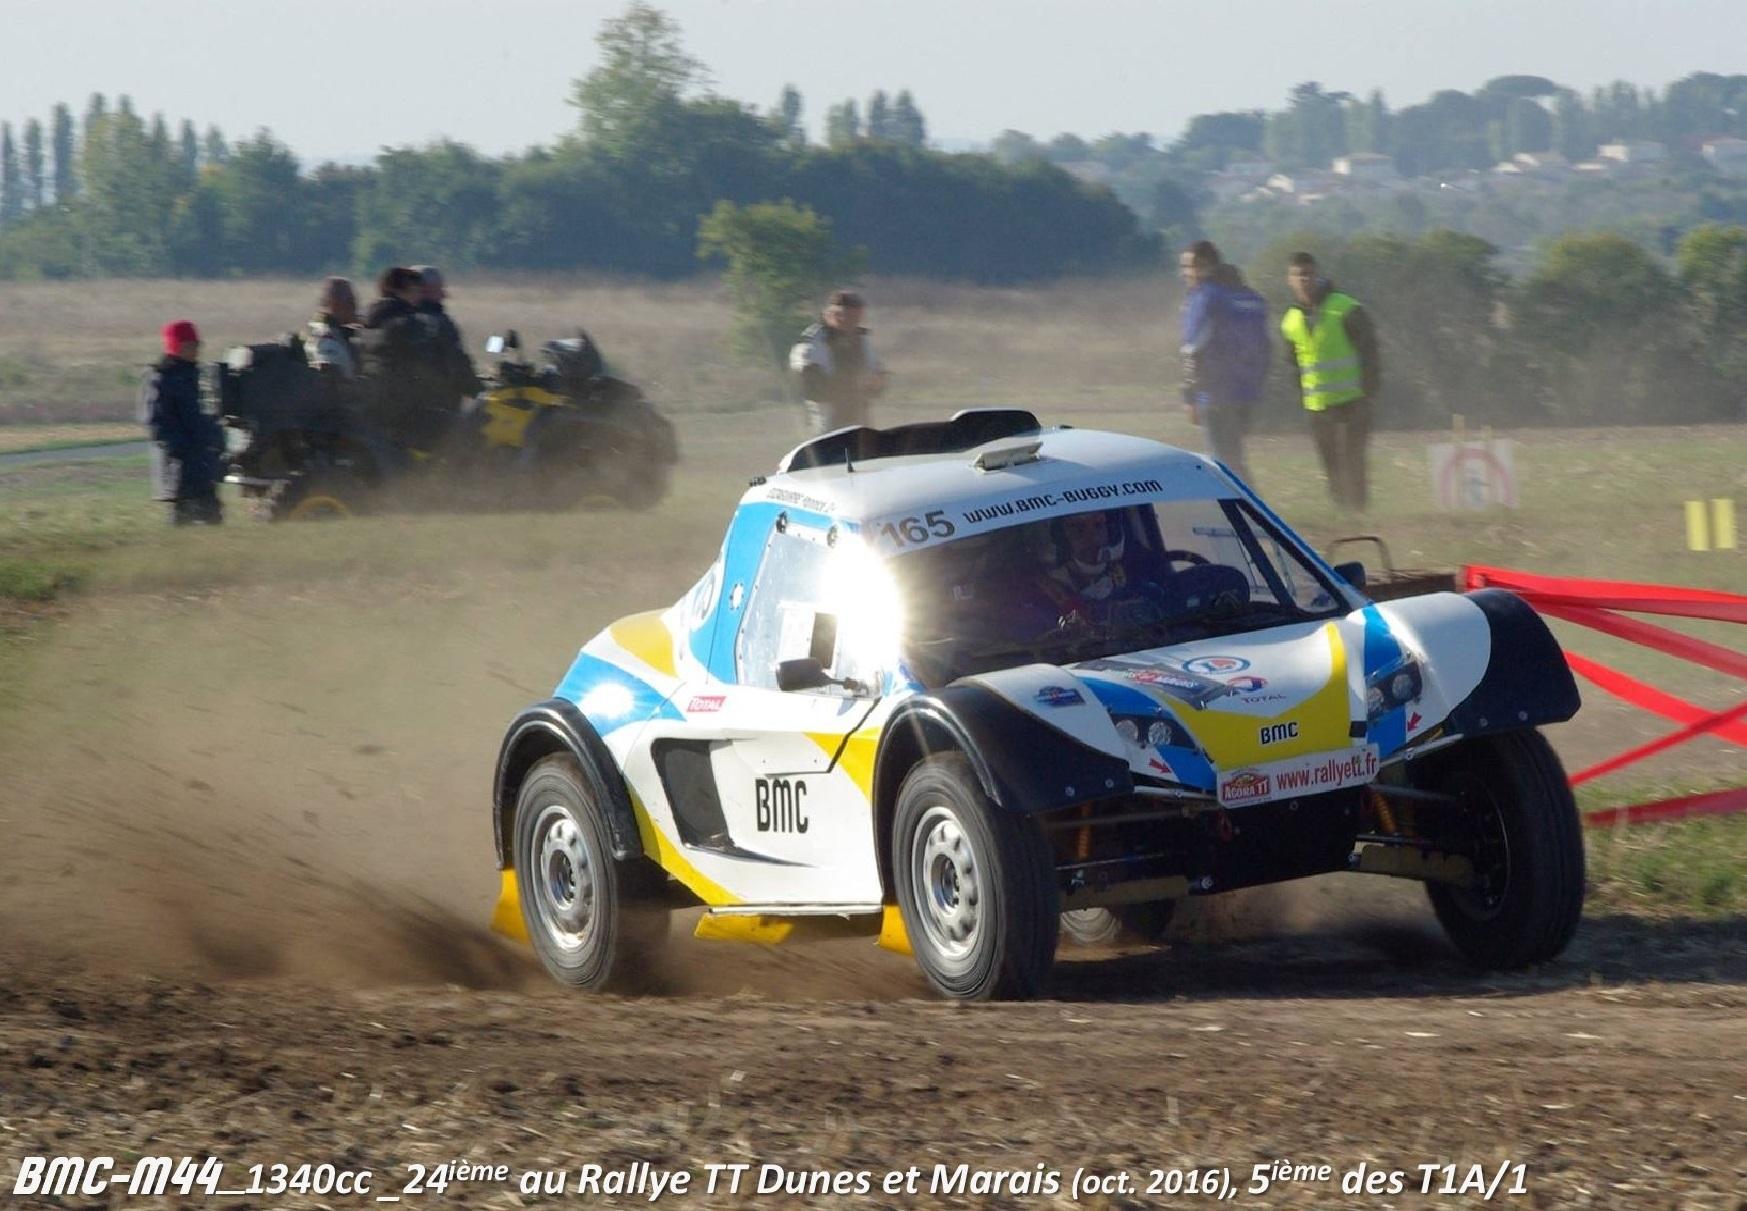 BMC-M44_Saison 2016_02